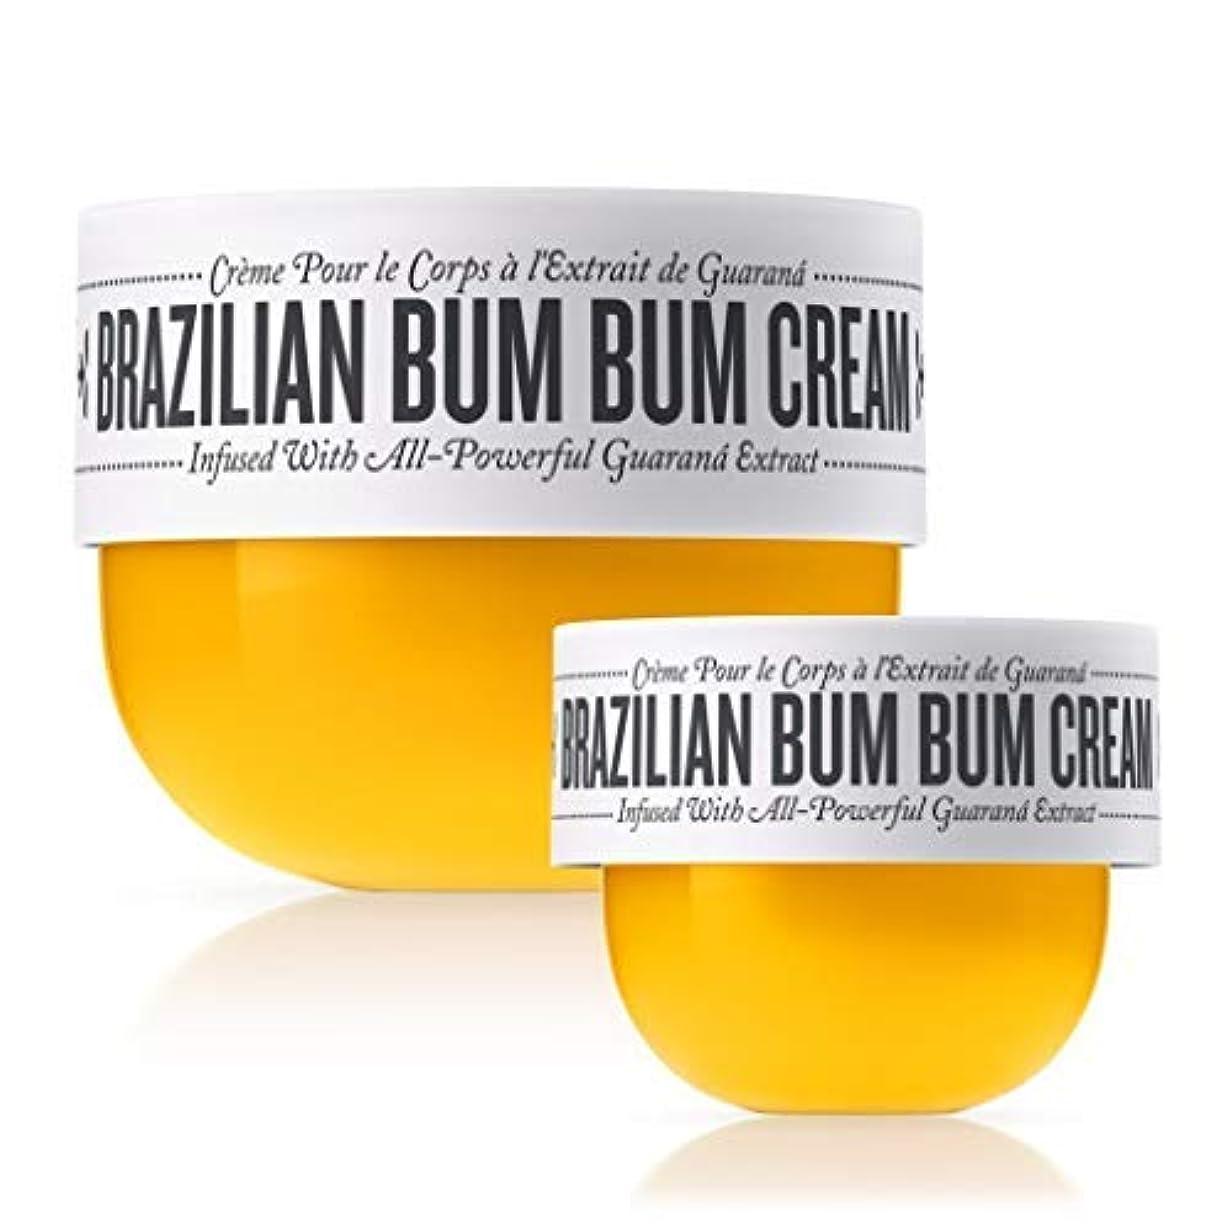 哀入る家族Sol de Janeiro Bum Bum Cream Includes a full size (240ml) and a travel size (75ml) Brazilian Bum Bum Cream. -...